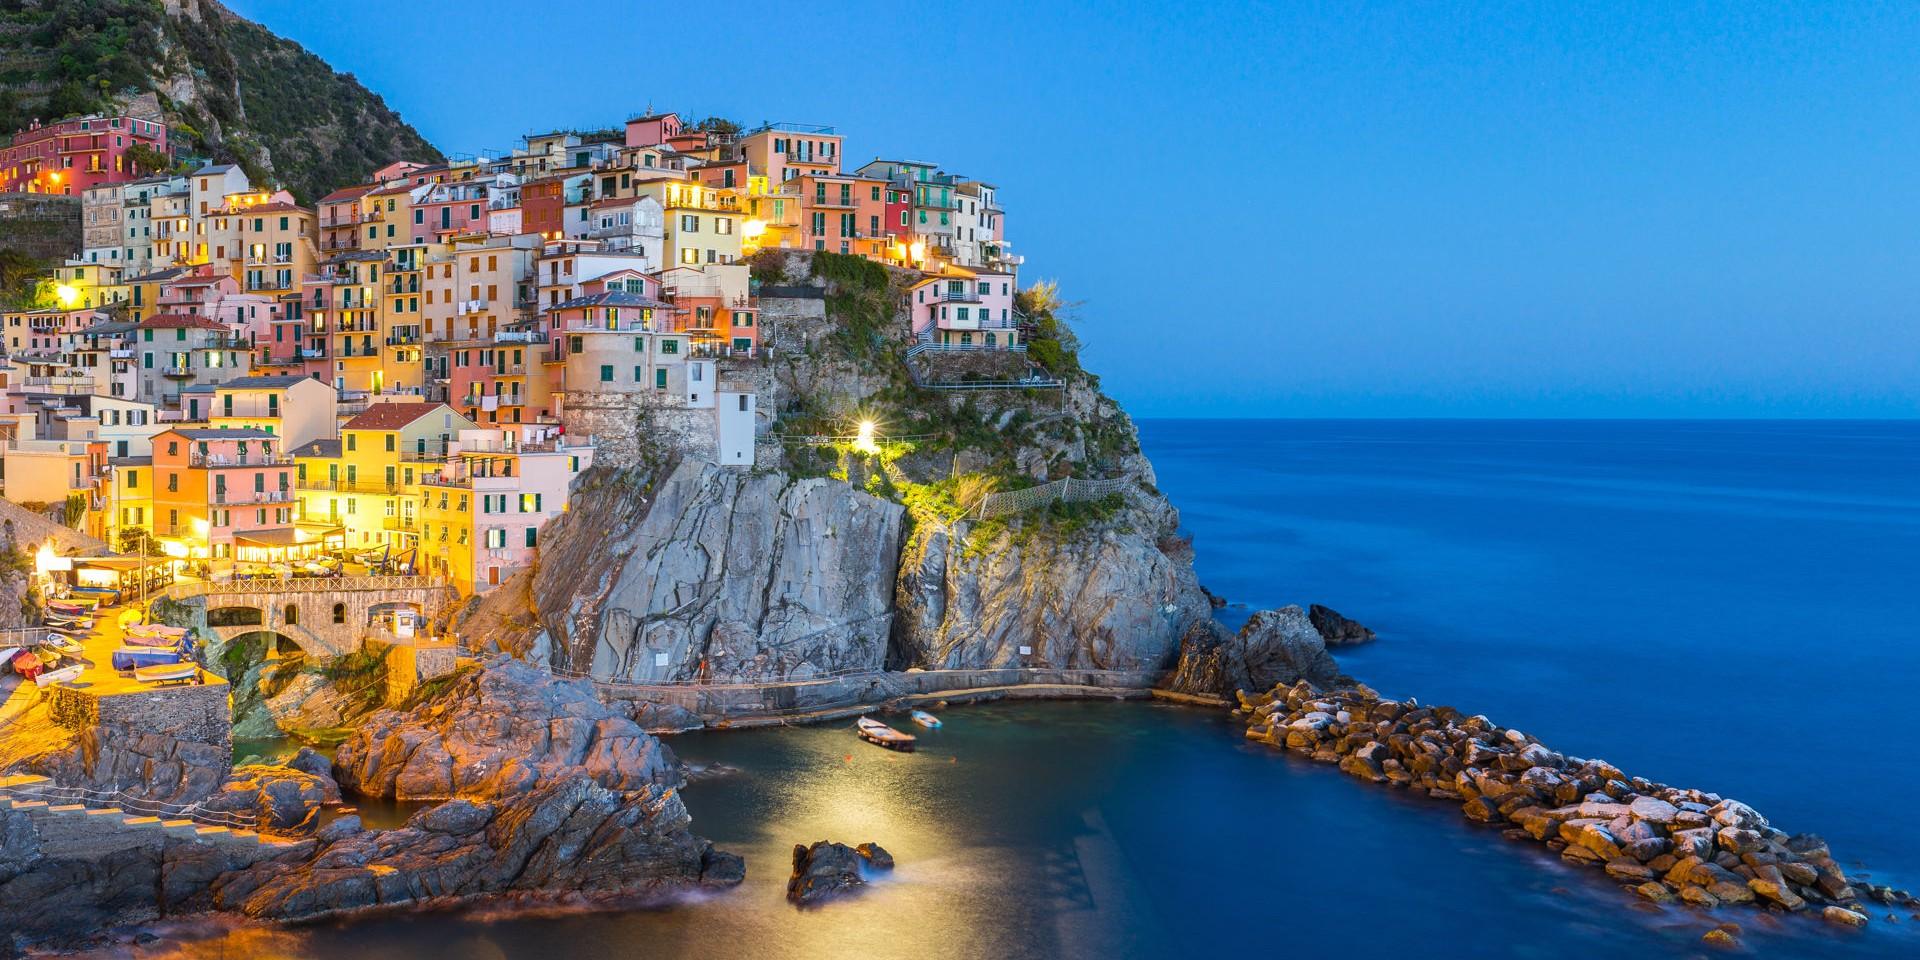 Le bellezze storiche e naturali delle Cinque Terre